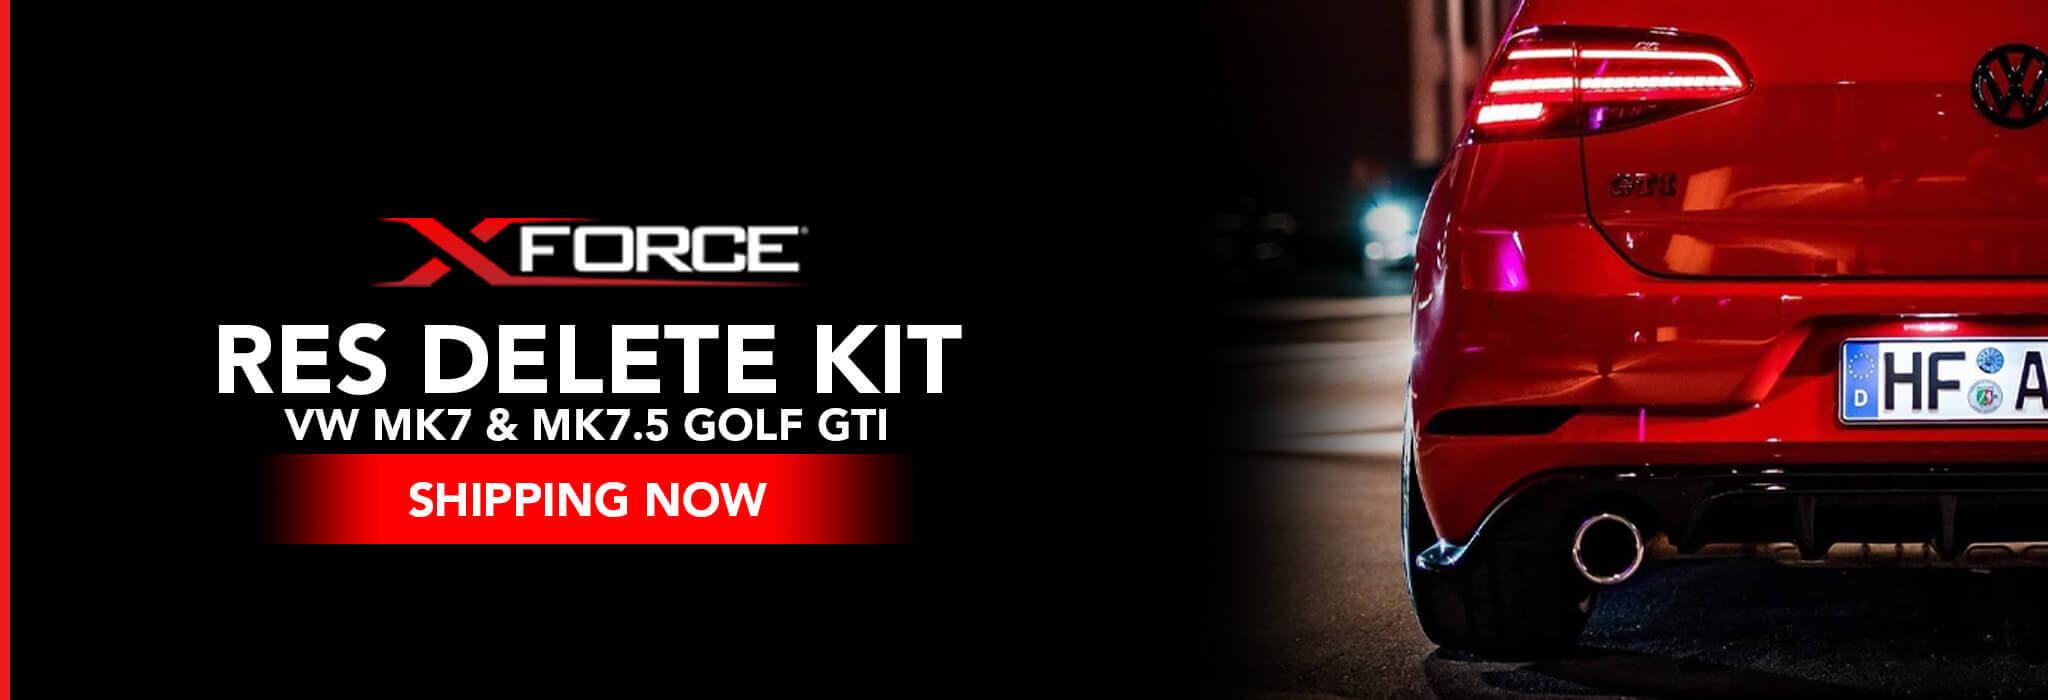 XFORCE Resonator Delete Kit - VW MK7/MK7.5 GOLF GTI